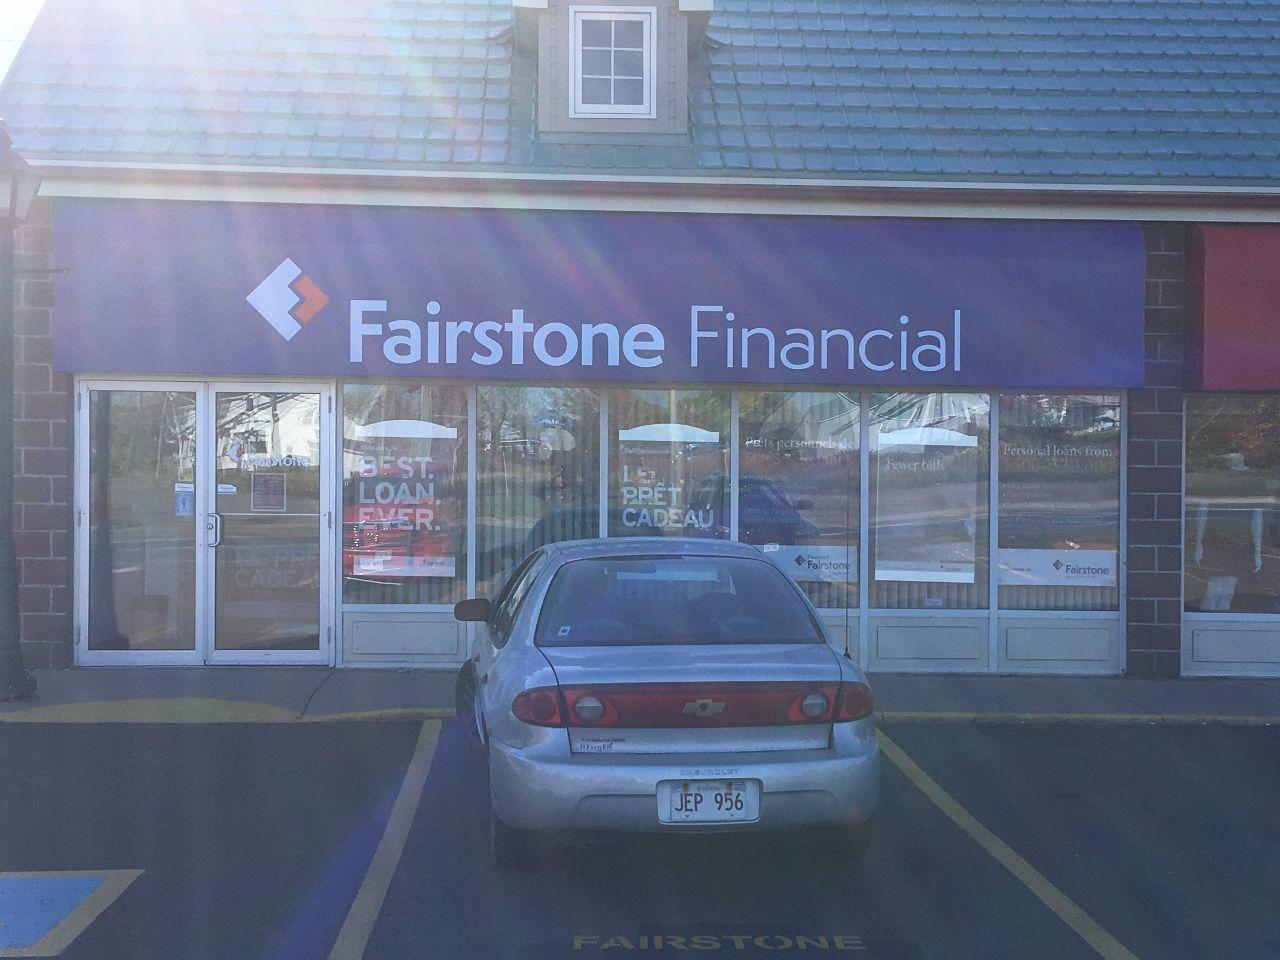 Fairstone in Moncton